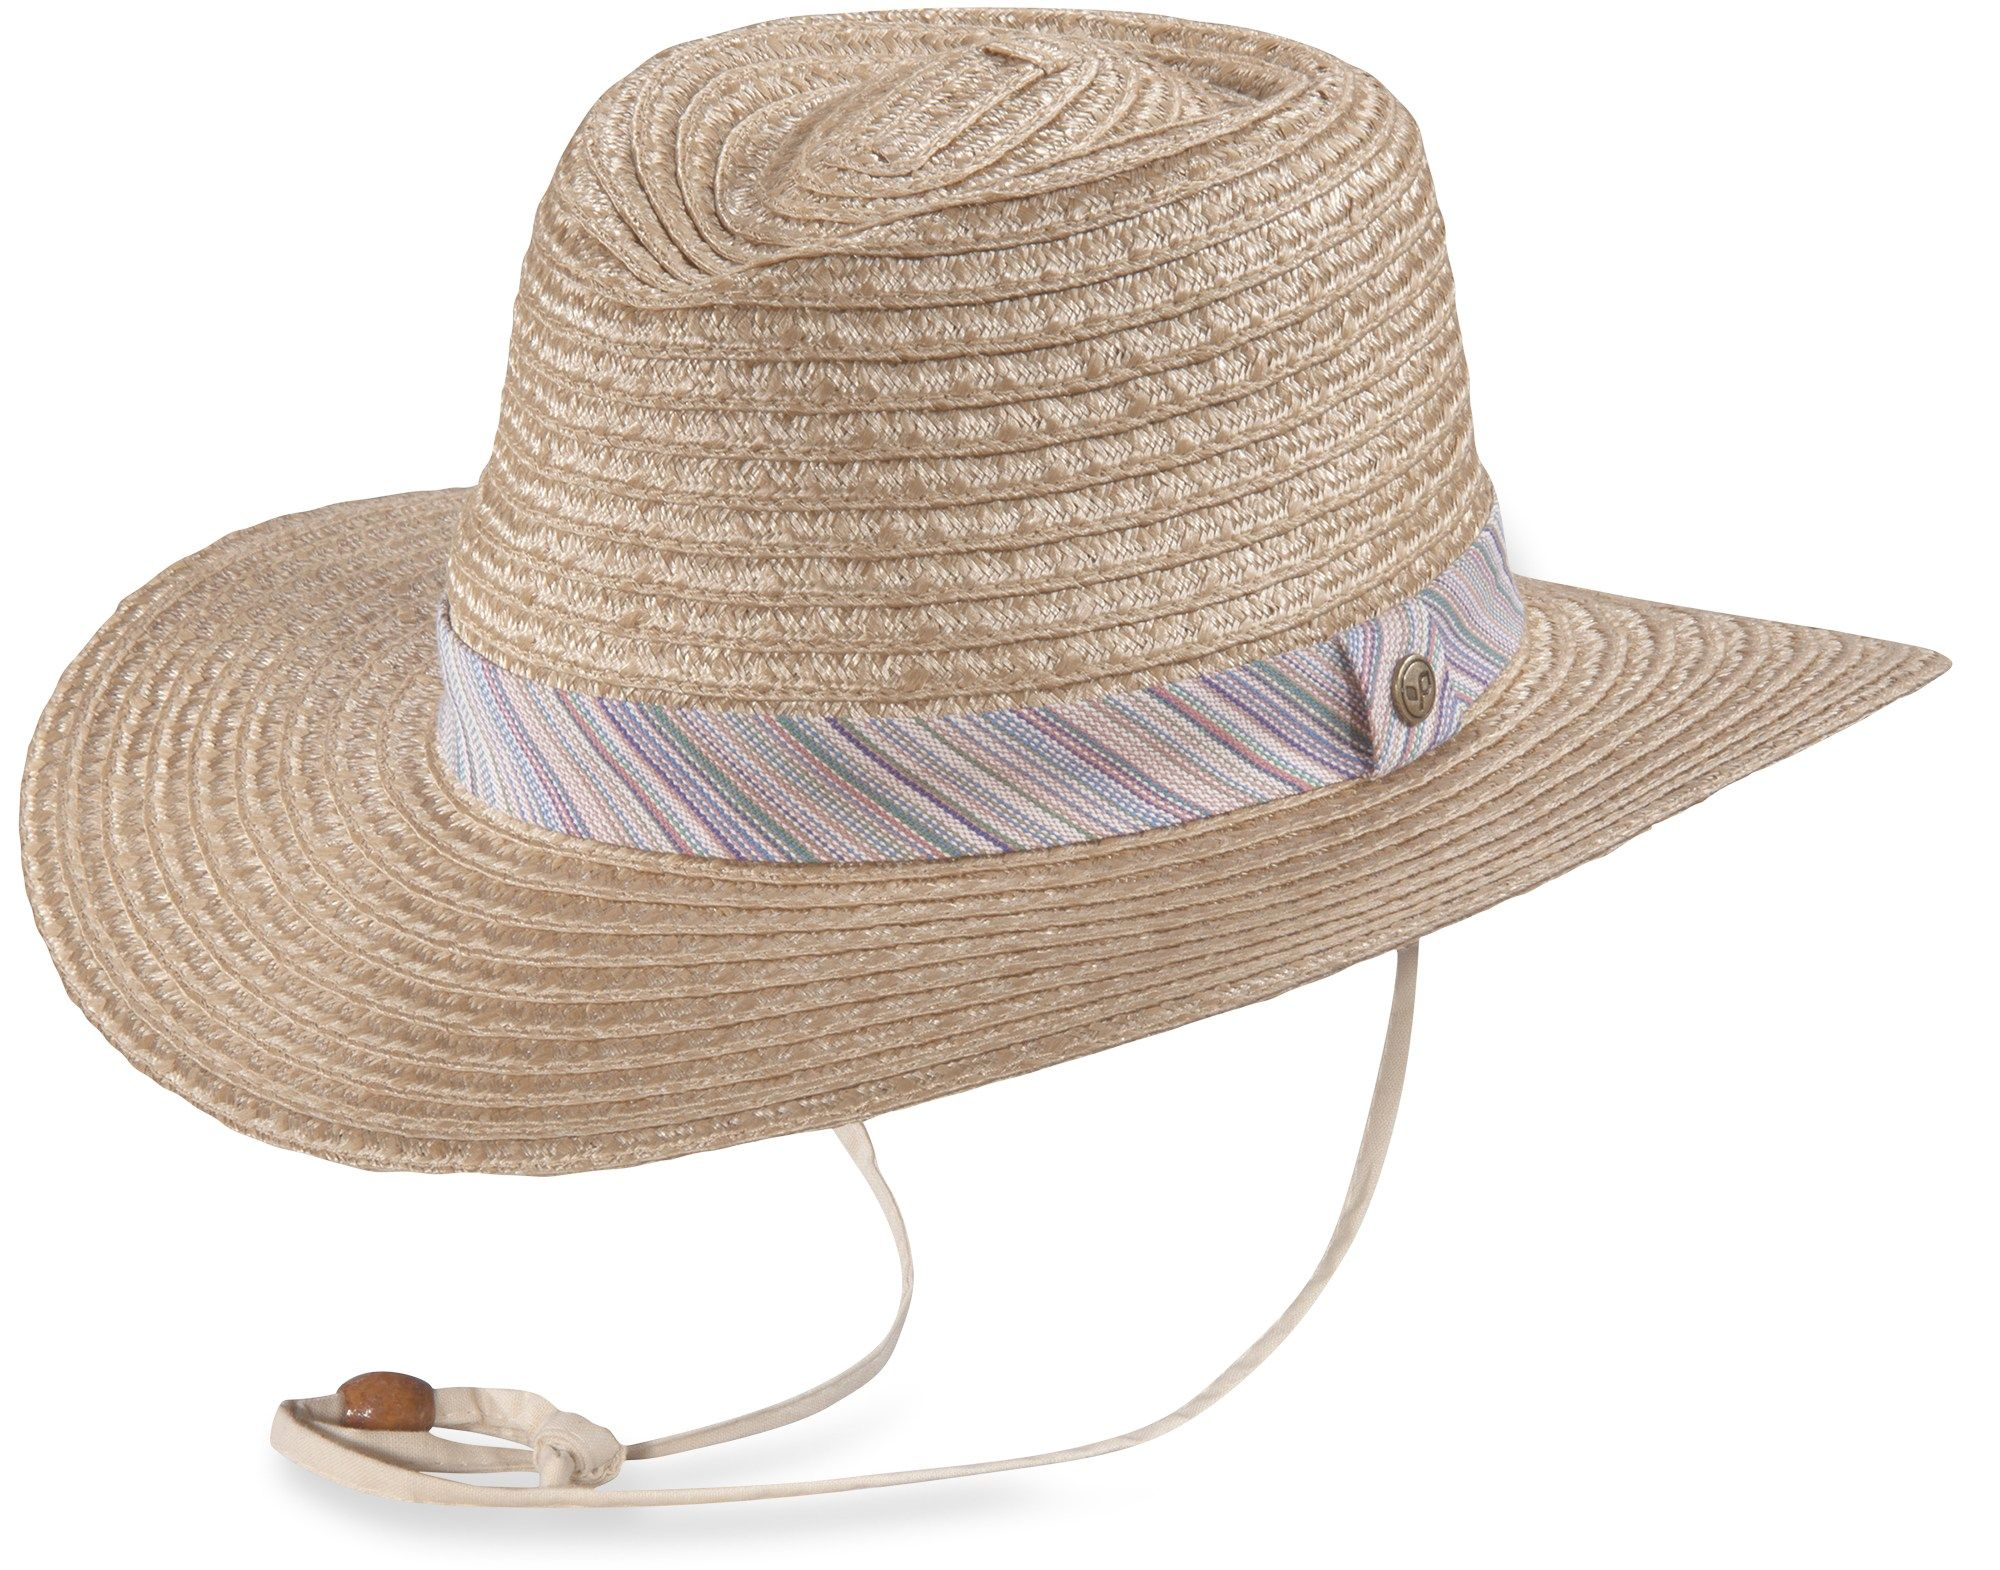 1766f5c28 Pistil Nala Sun Hat- Women's - REI.com | Traveling: Outfits, Gadgets ...